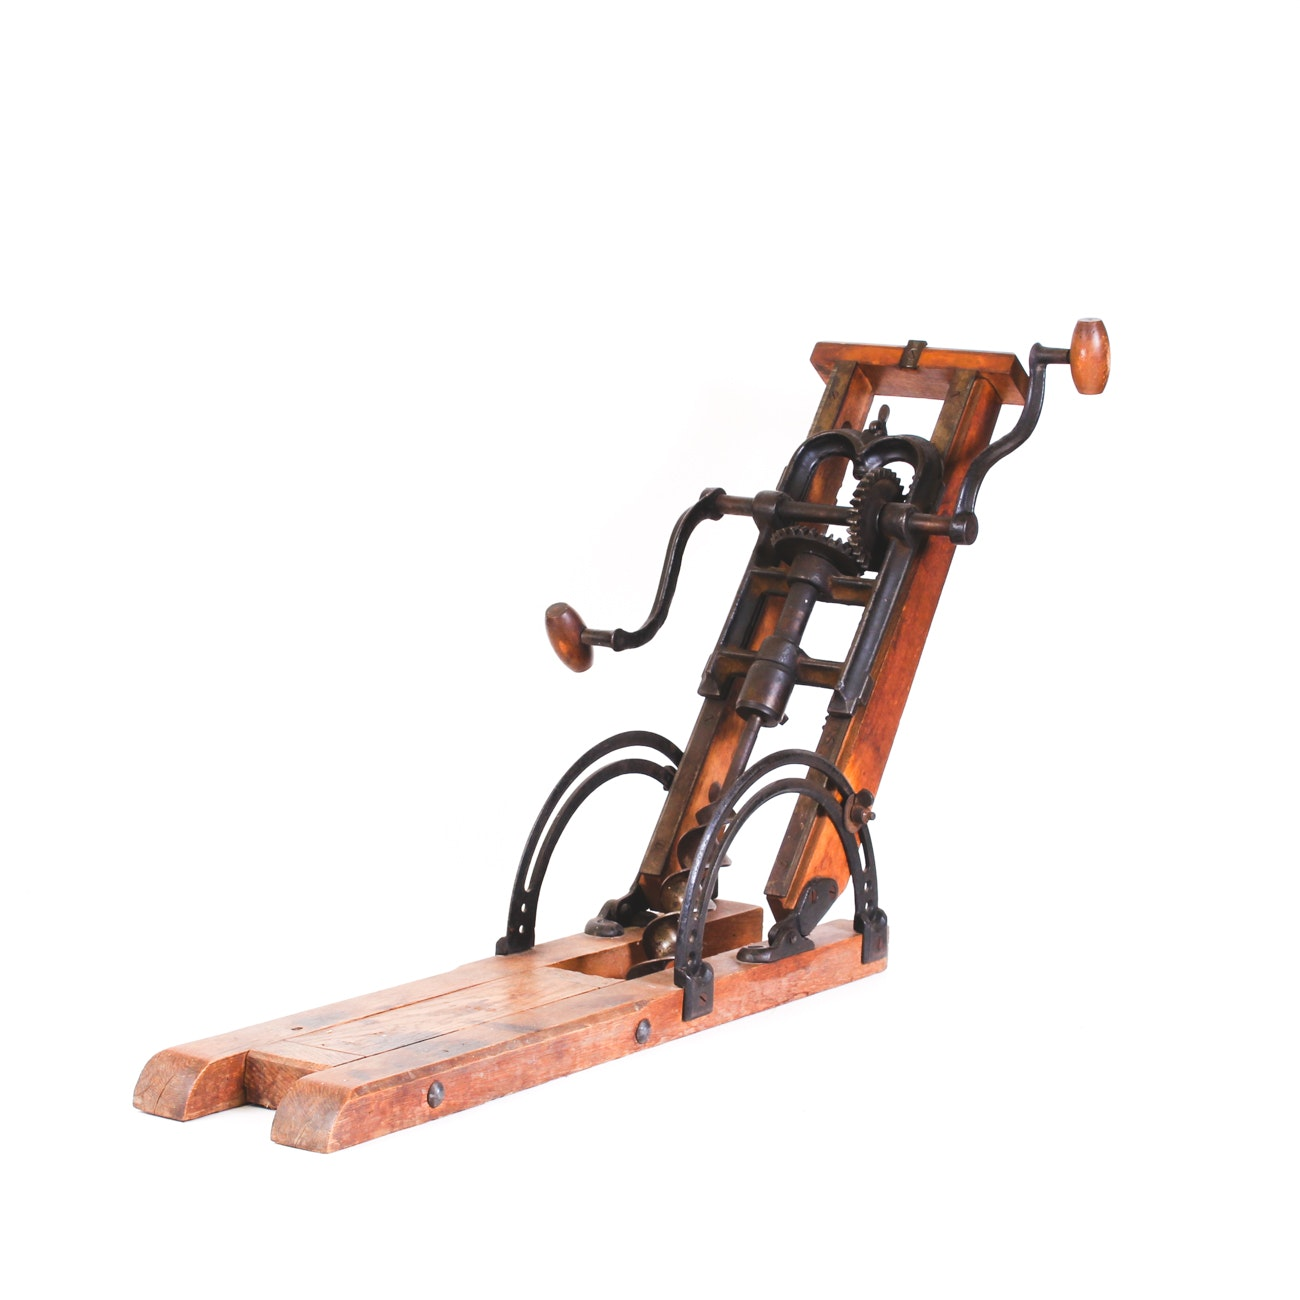 Antique Hand-Crank Barn Beam Auger